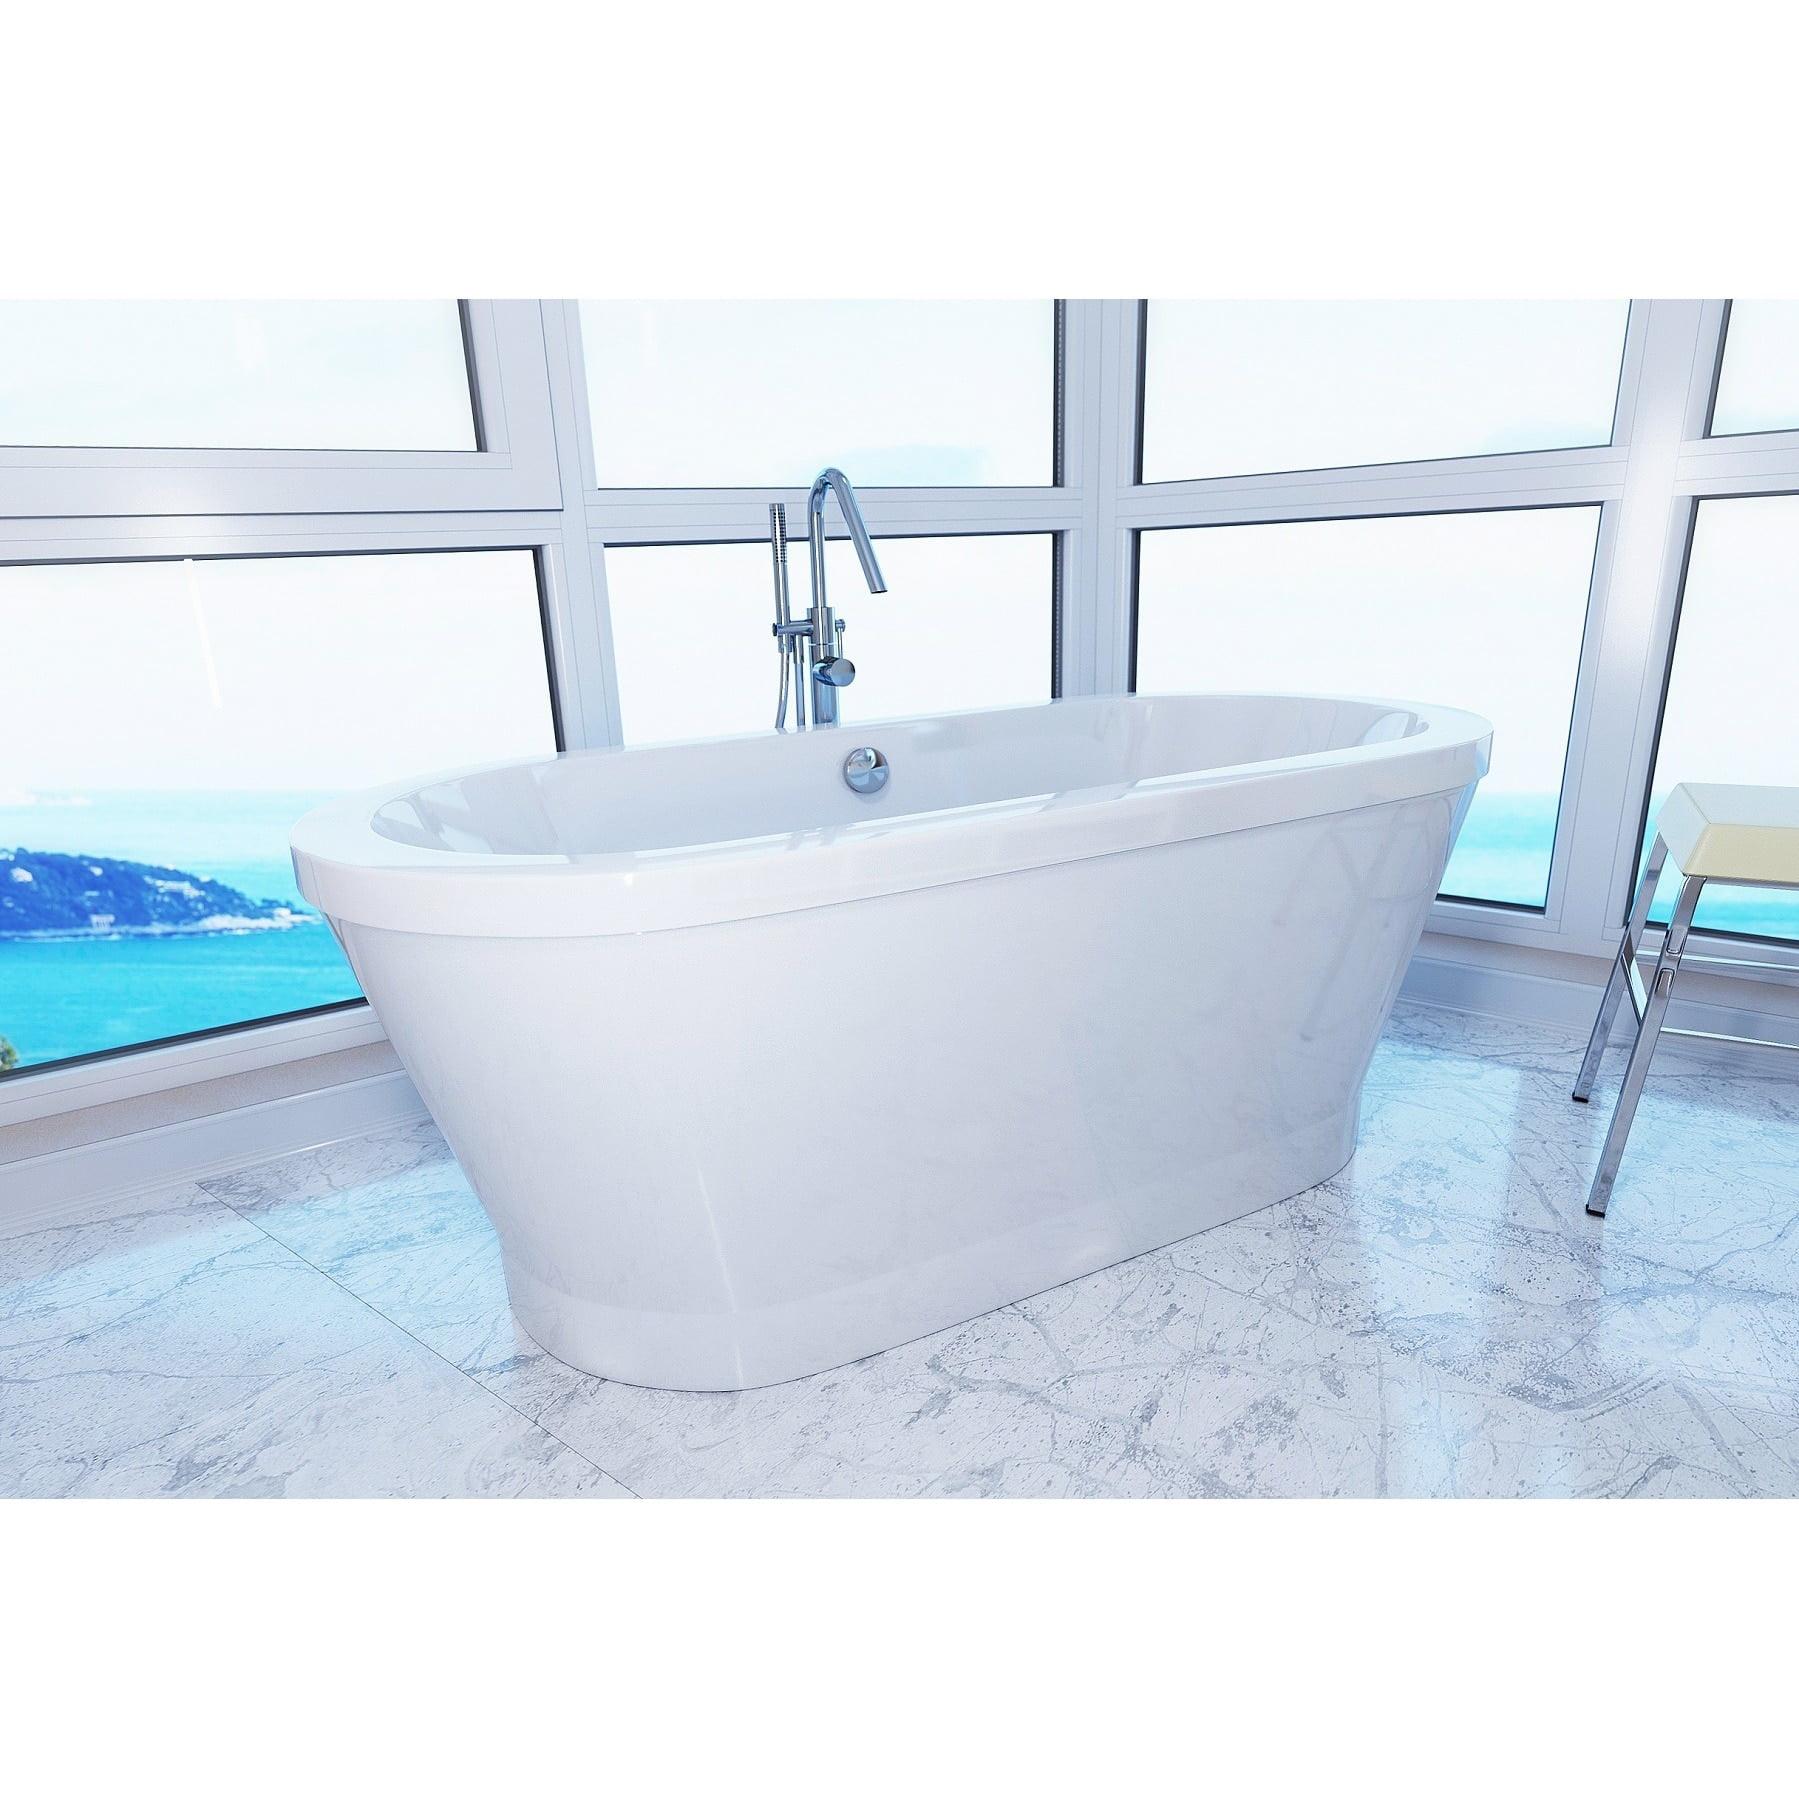 Aquatica PureScape 302 Freestanding Acrylic Bathtub - Walmart.com